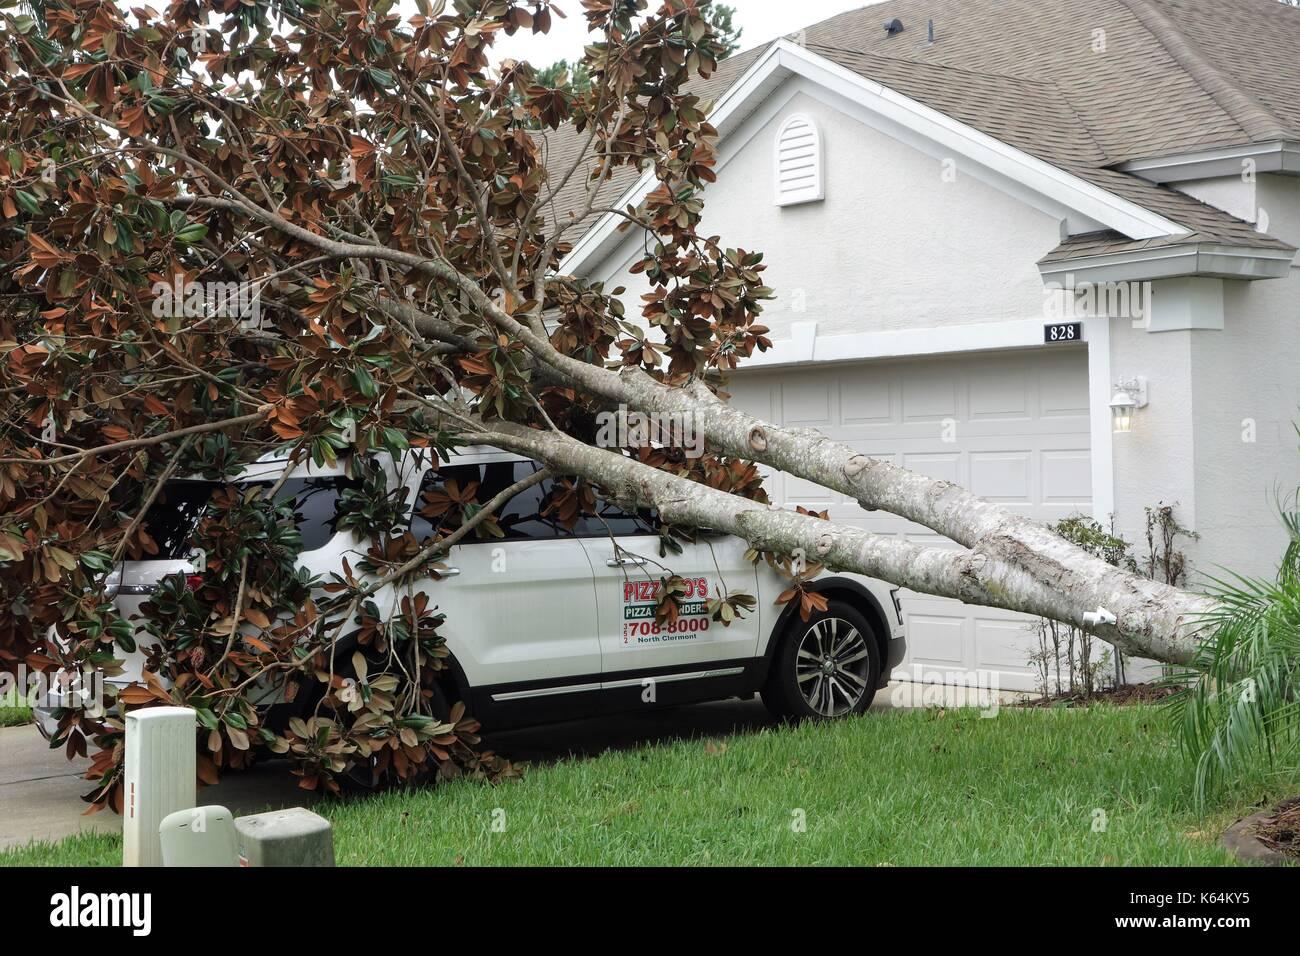 11th-september-2017-polk-county-orlando-florida-usa-hurricane-irma-K64KY5.jpg